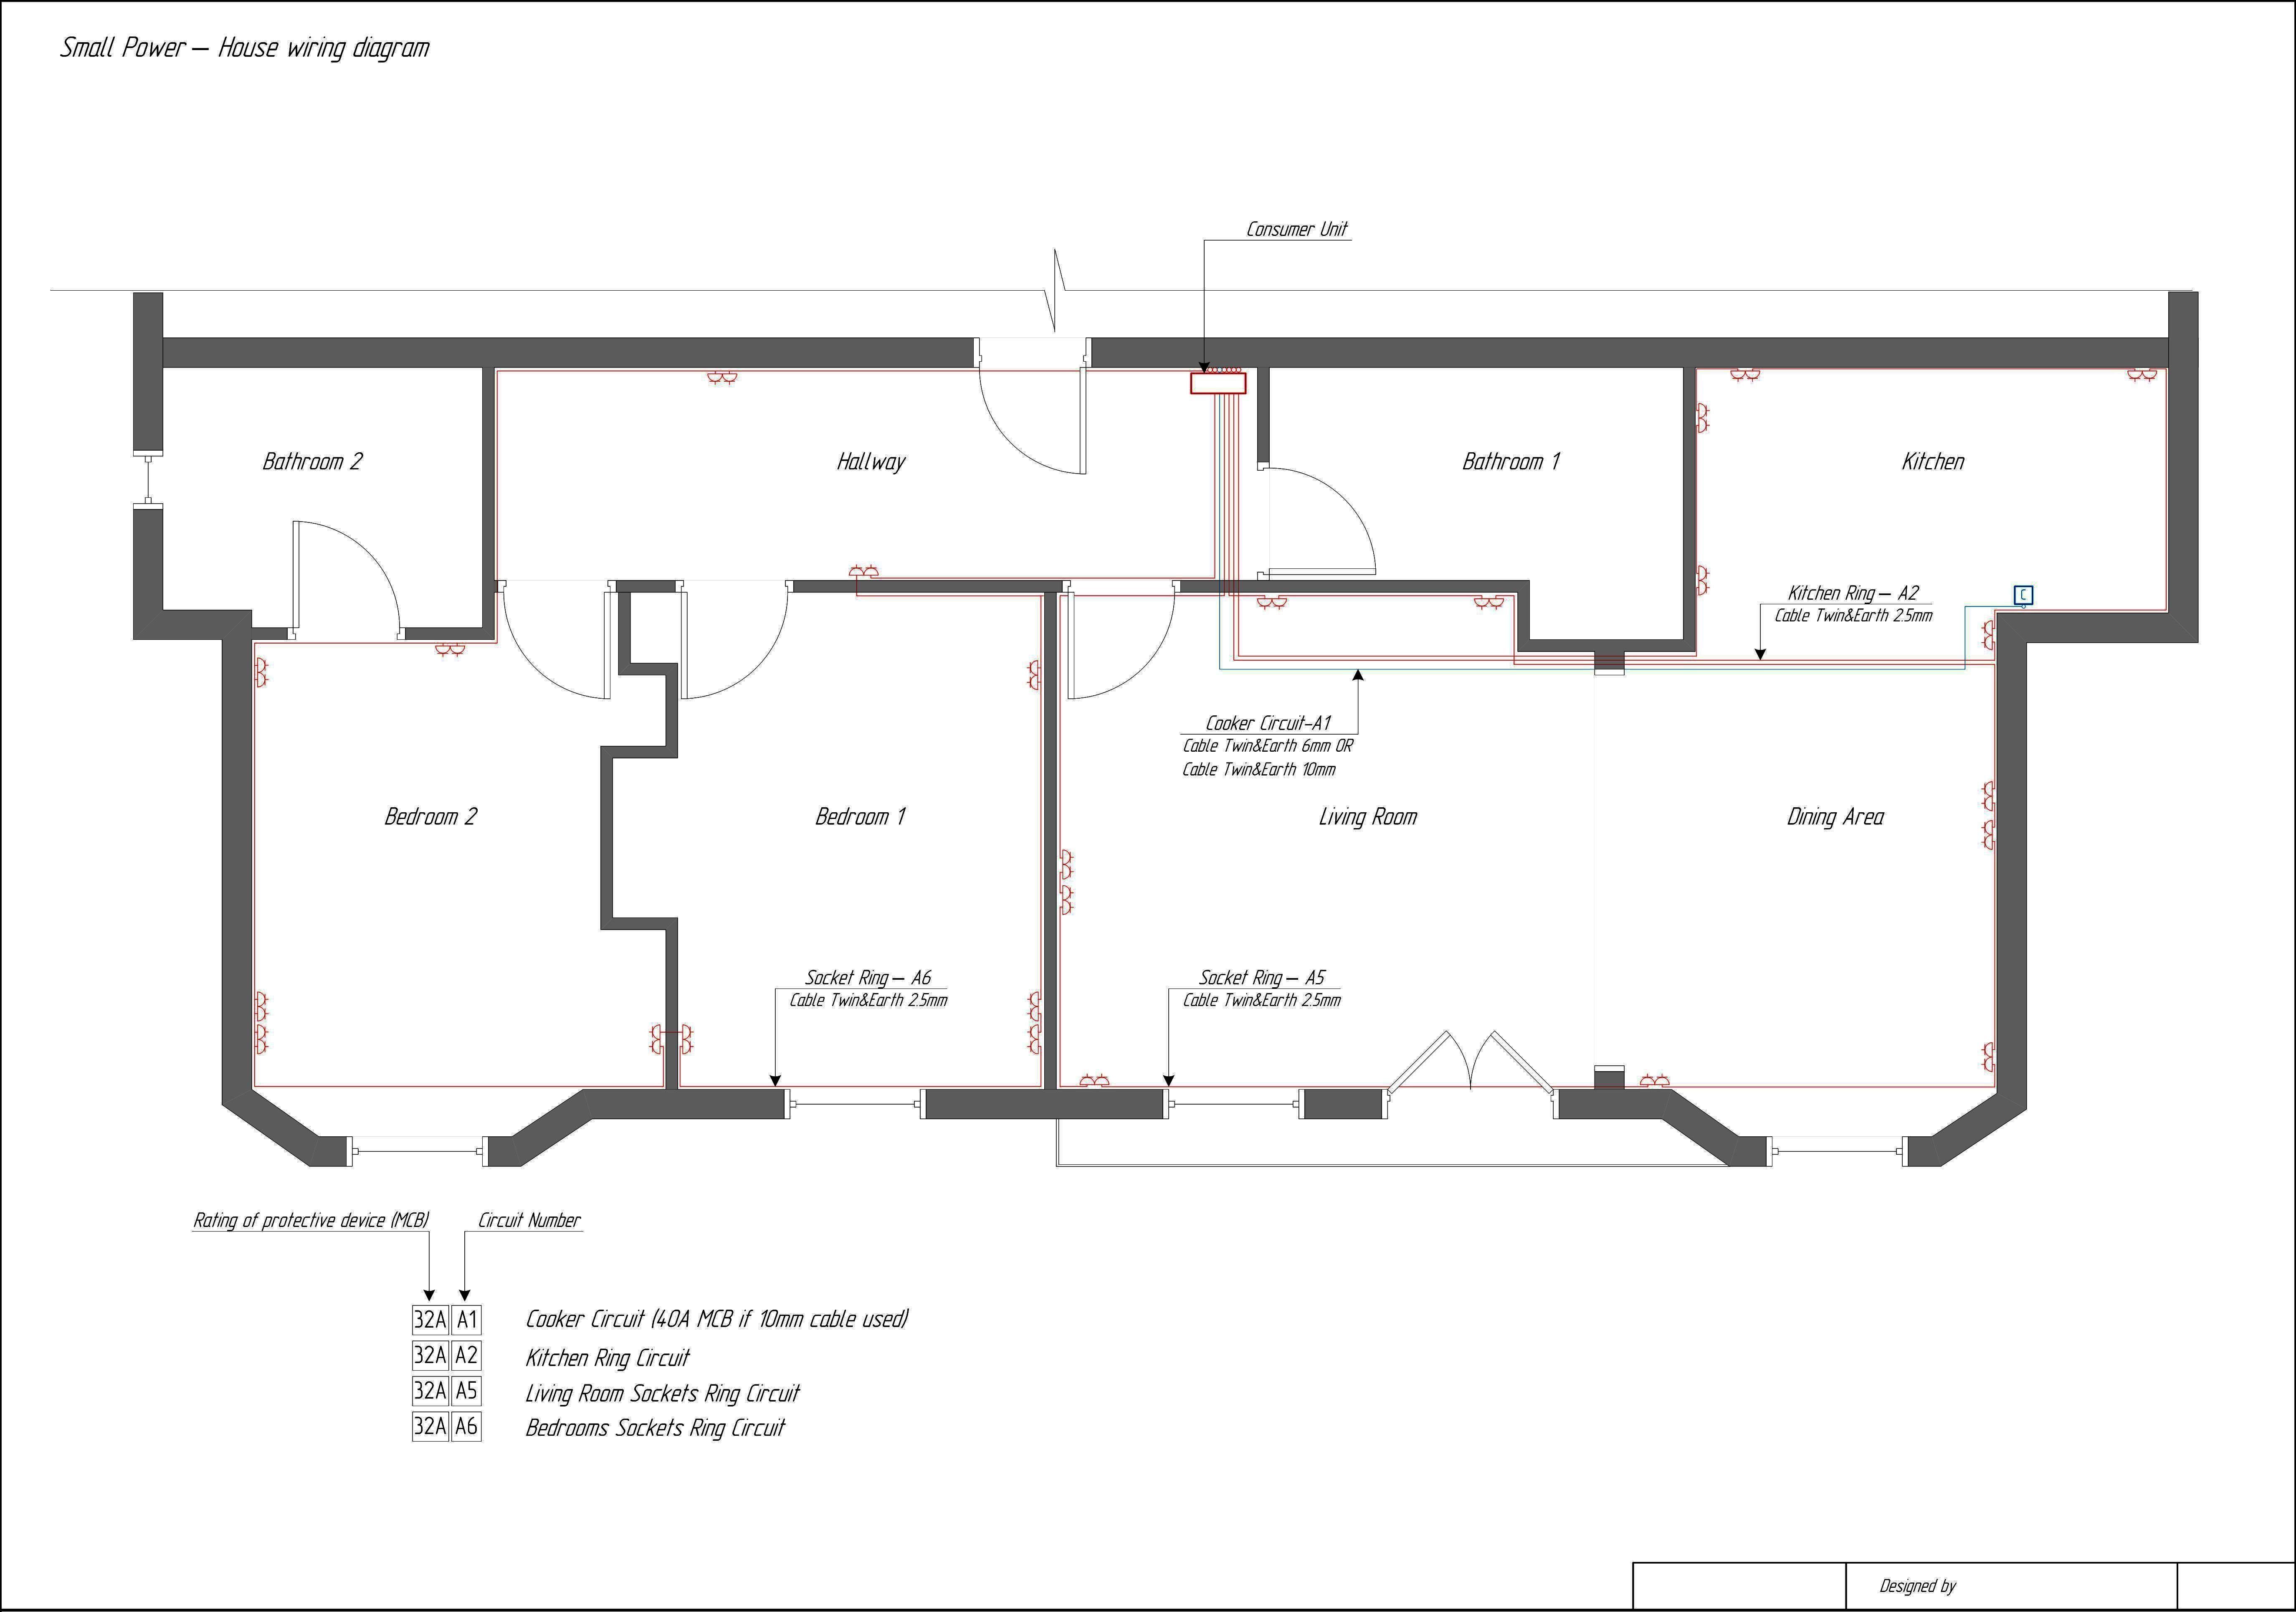 Home Theater Wiring Schematic